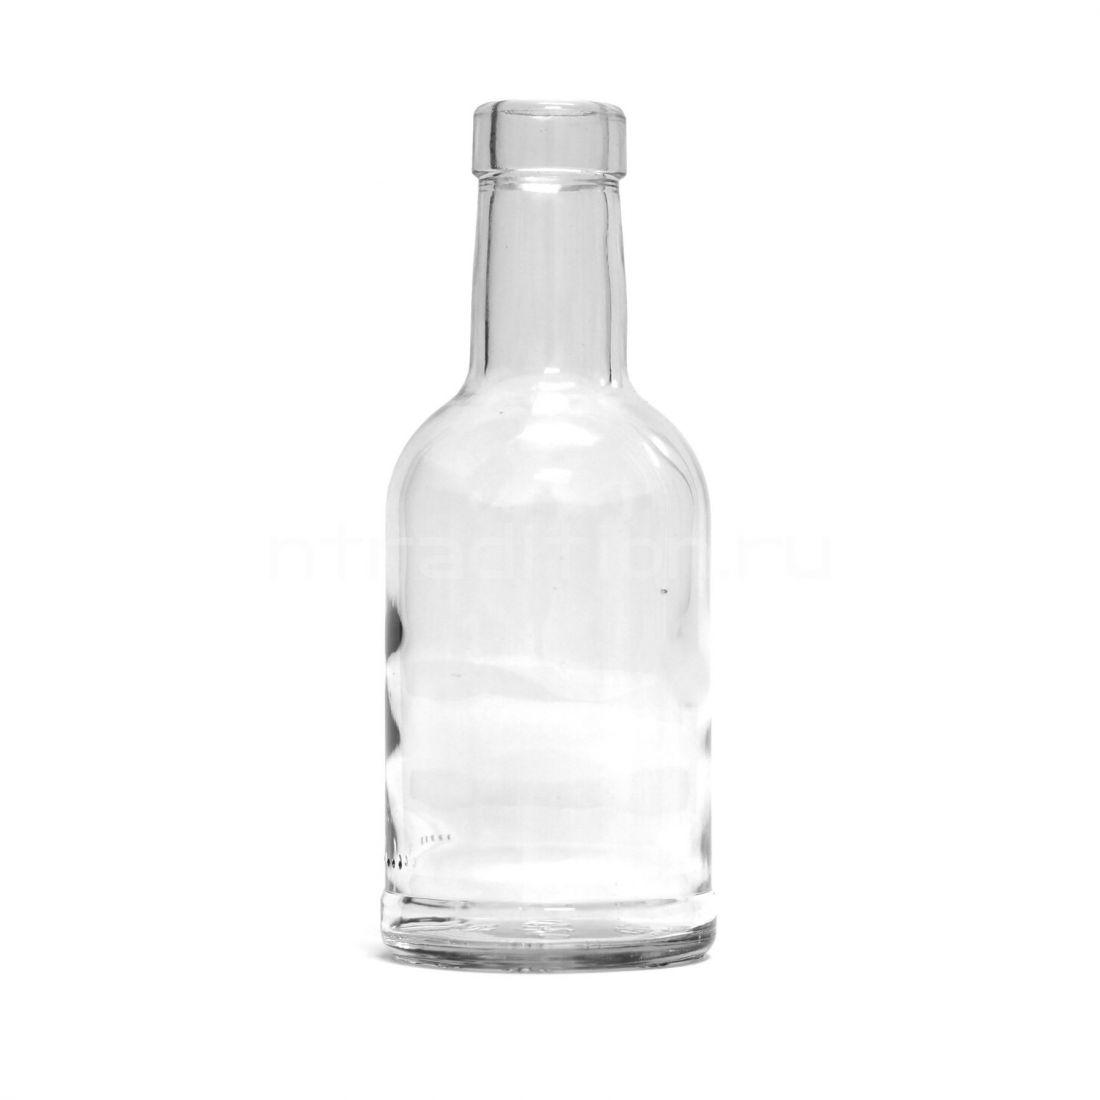 Бутылка Домашний самогон (чекушка), 0,2 л / 20 шт (под пробку Камю)